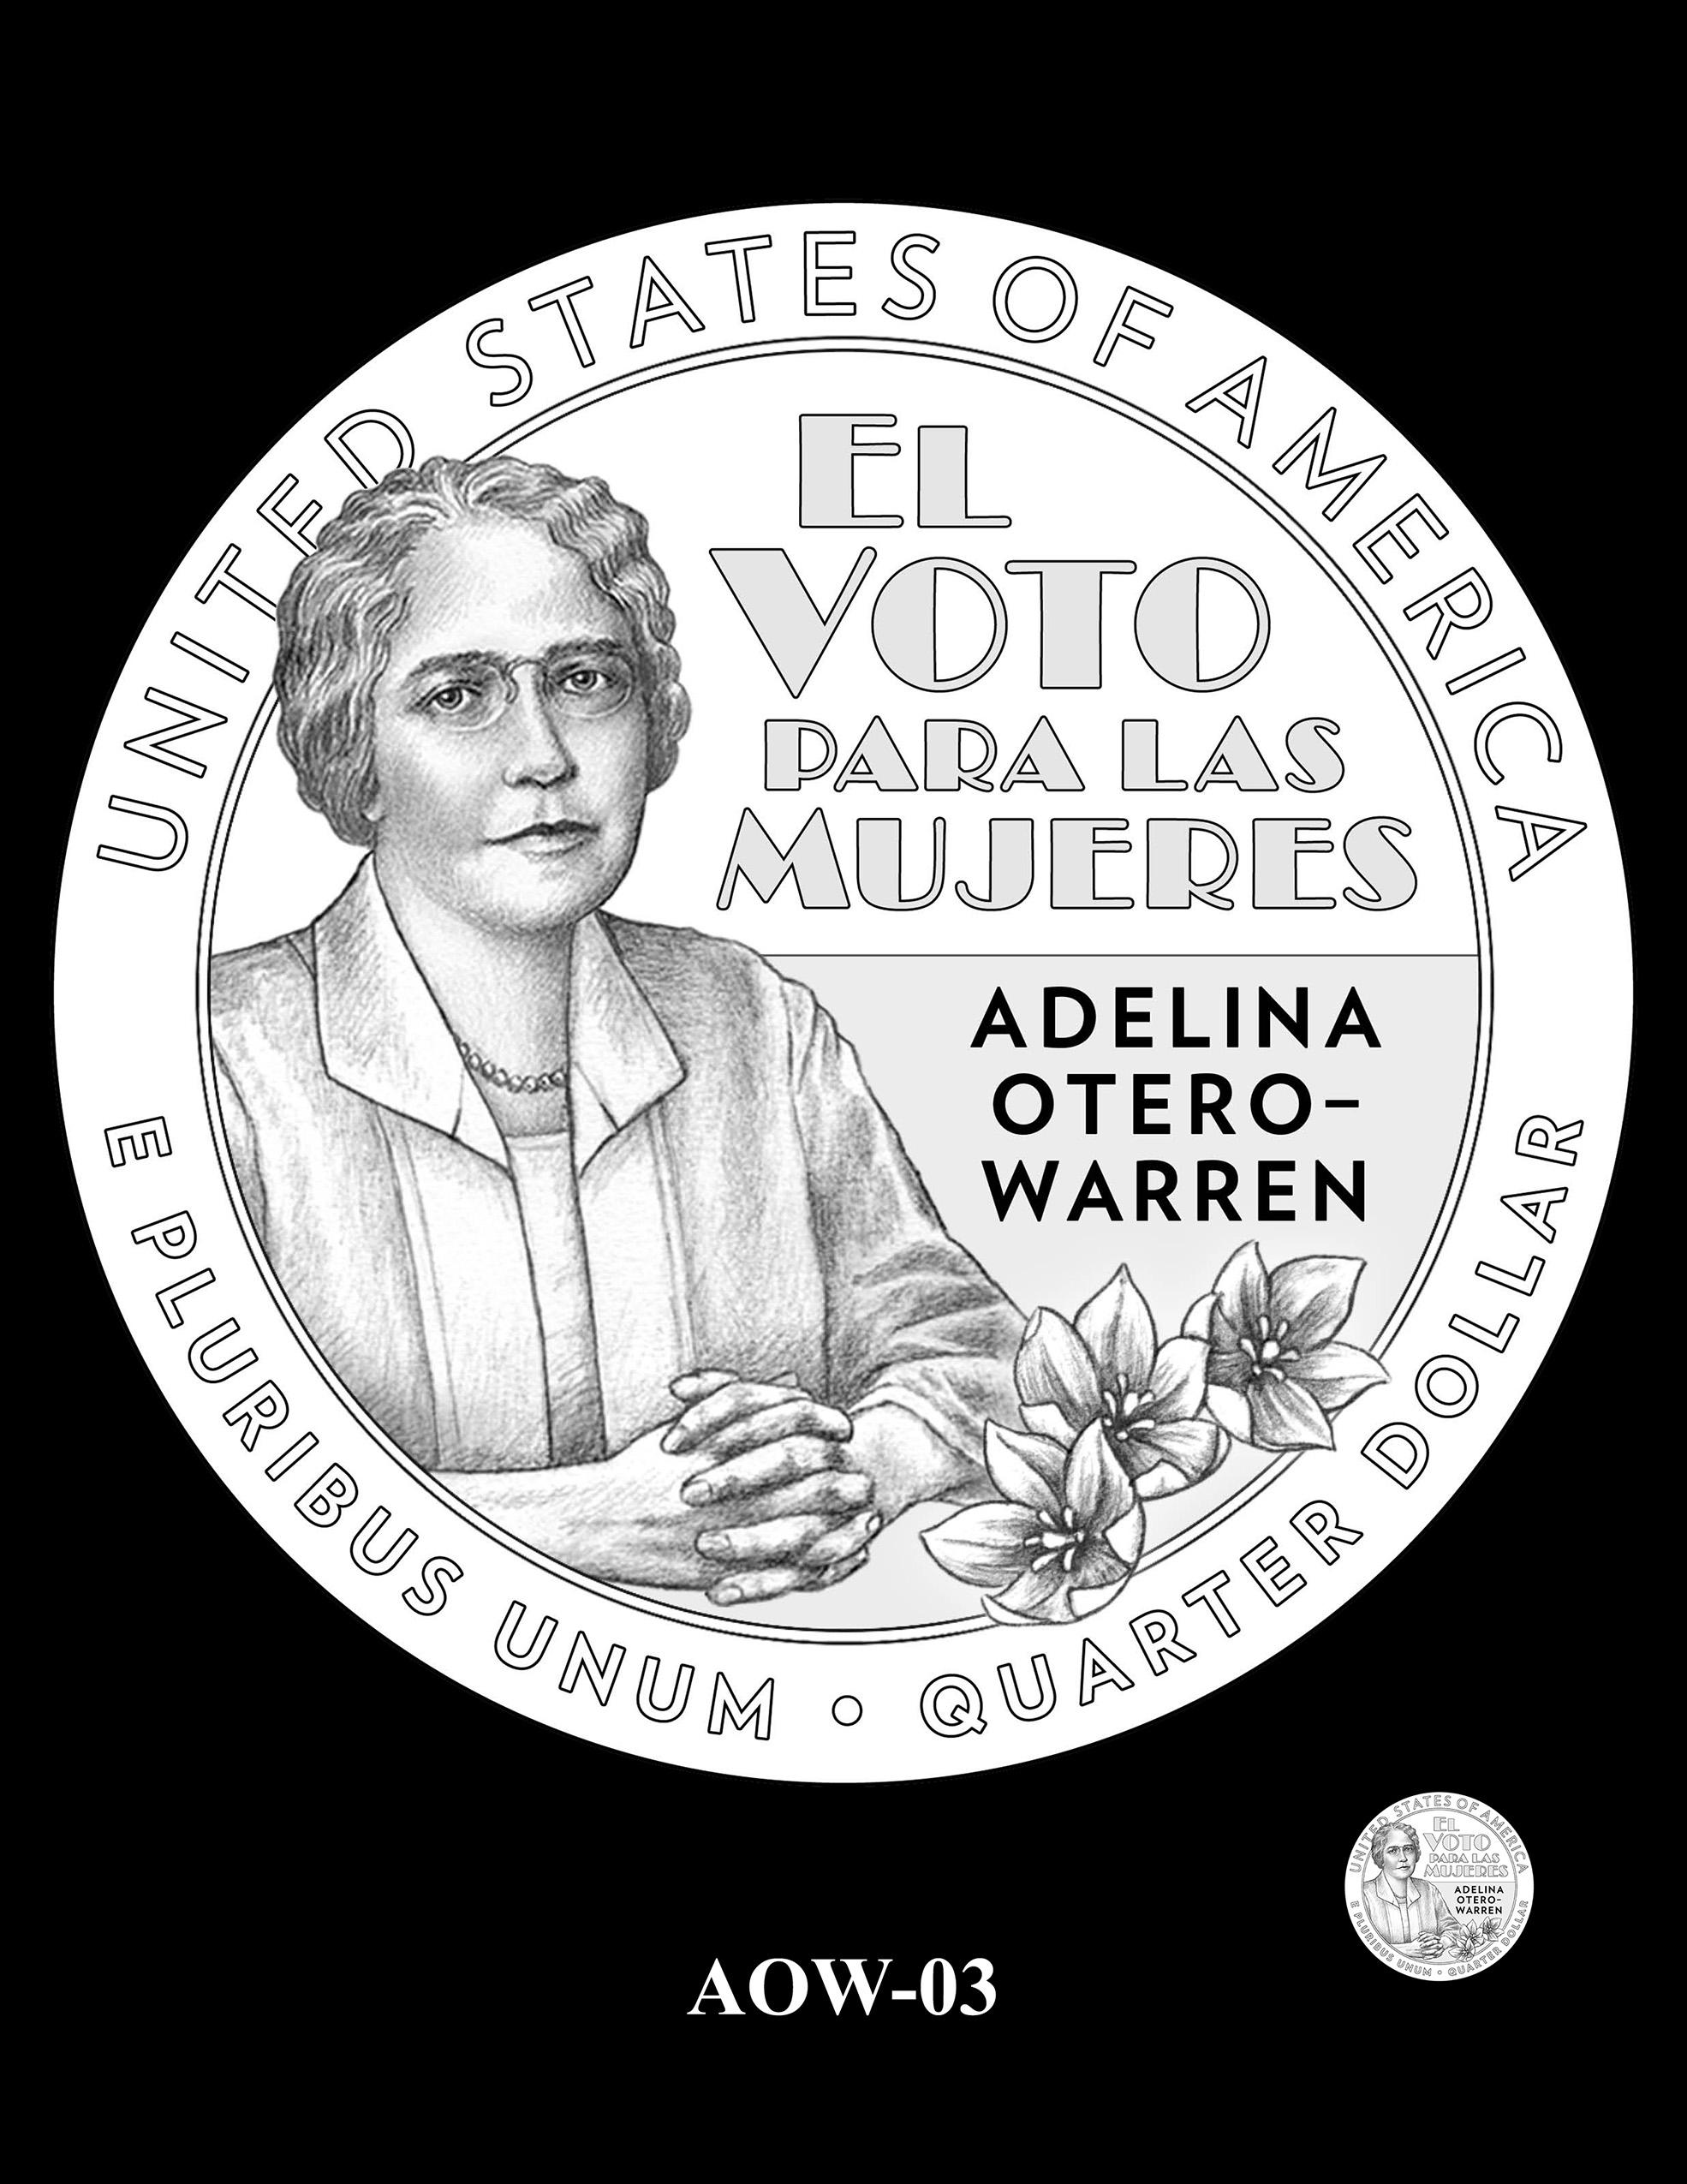 AOW-03 -- 2022 American Women Quarters - Adelina Otero-Warren